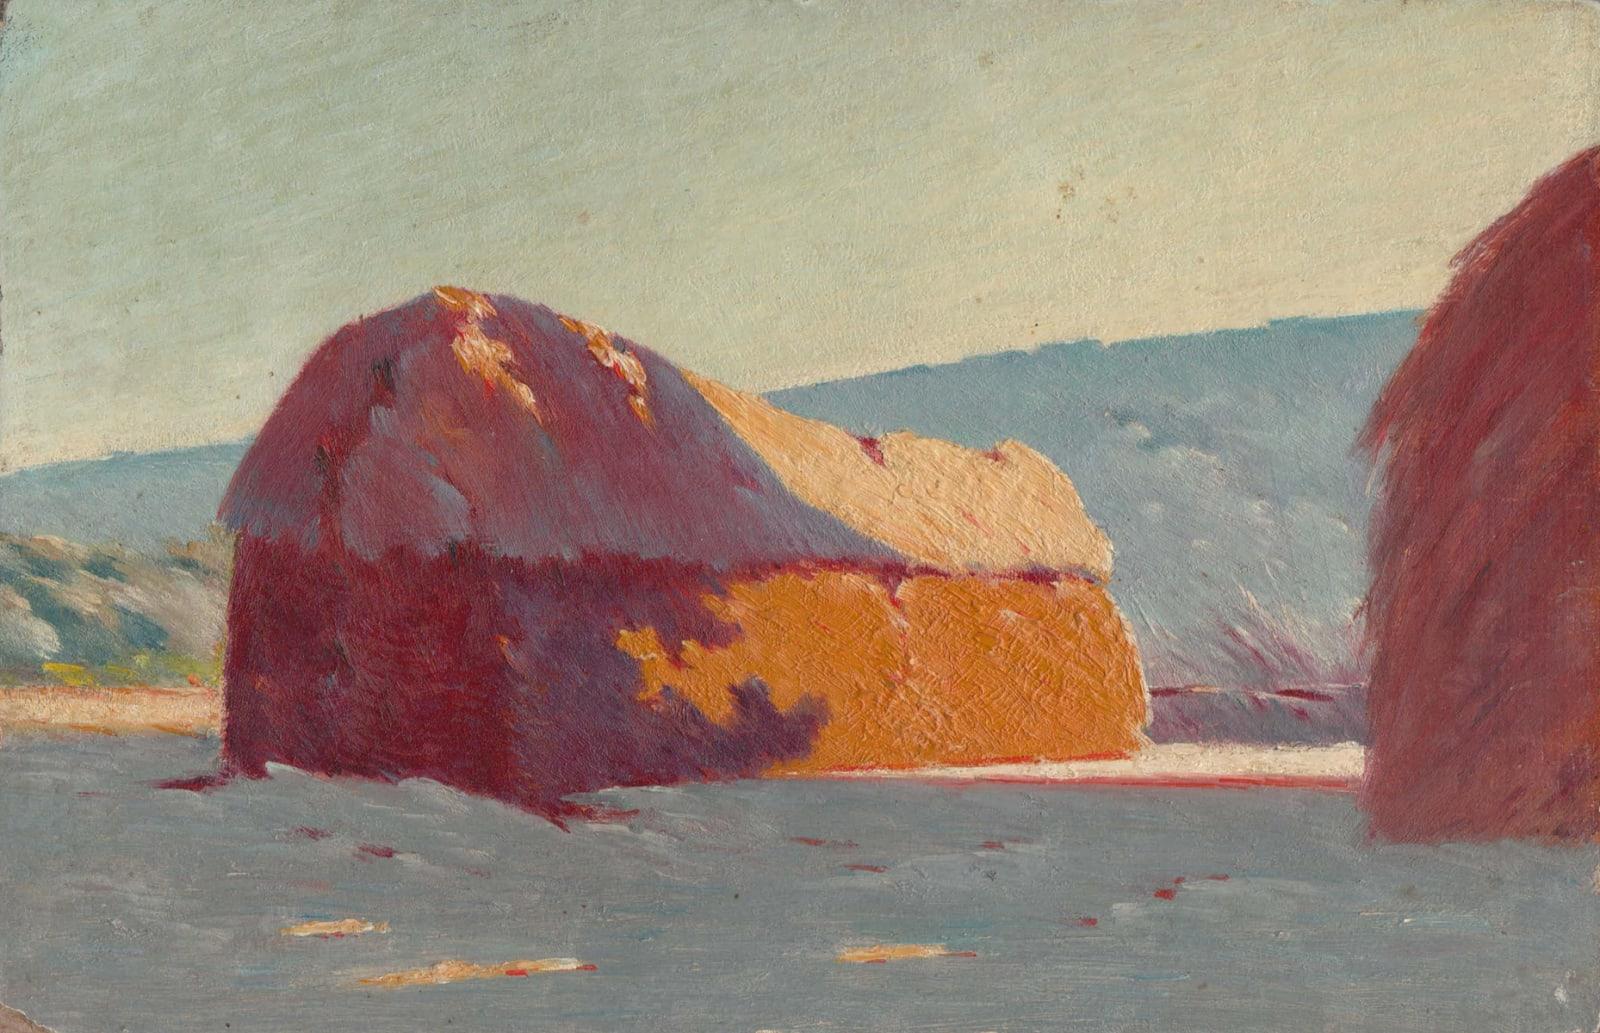 EDOUARD ATHÉNOSY, Haystack purple shadow, 1899